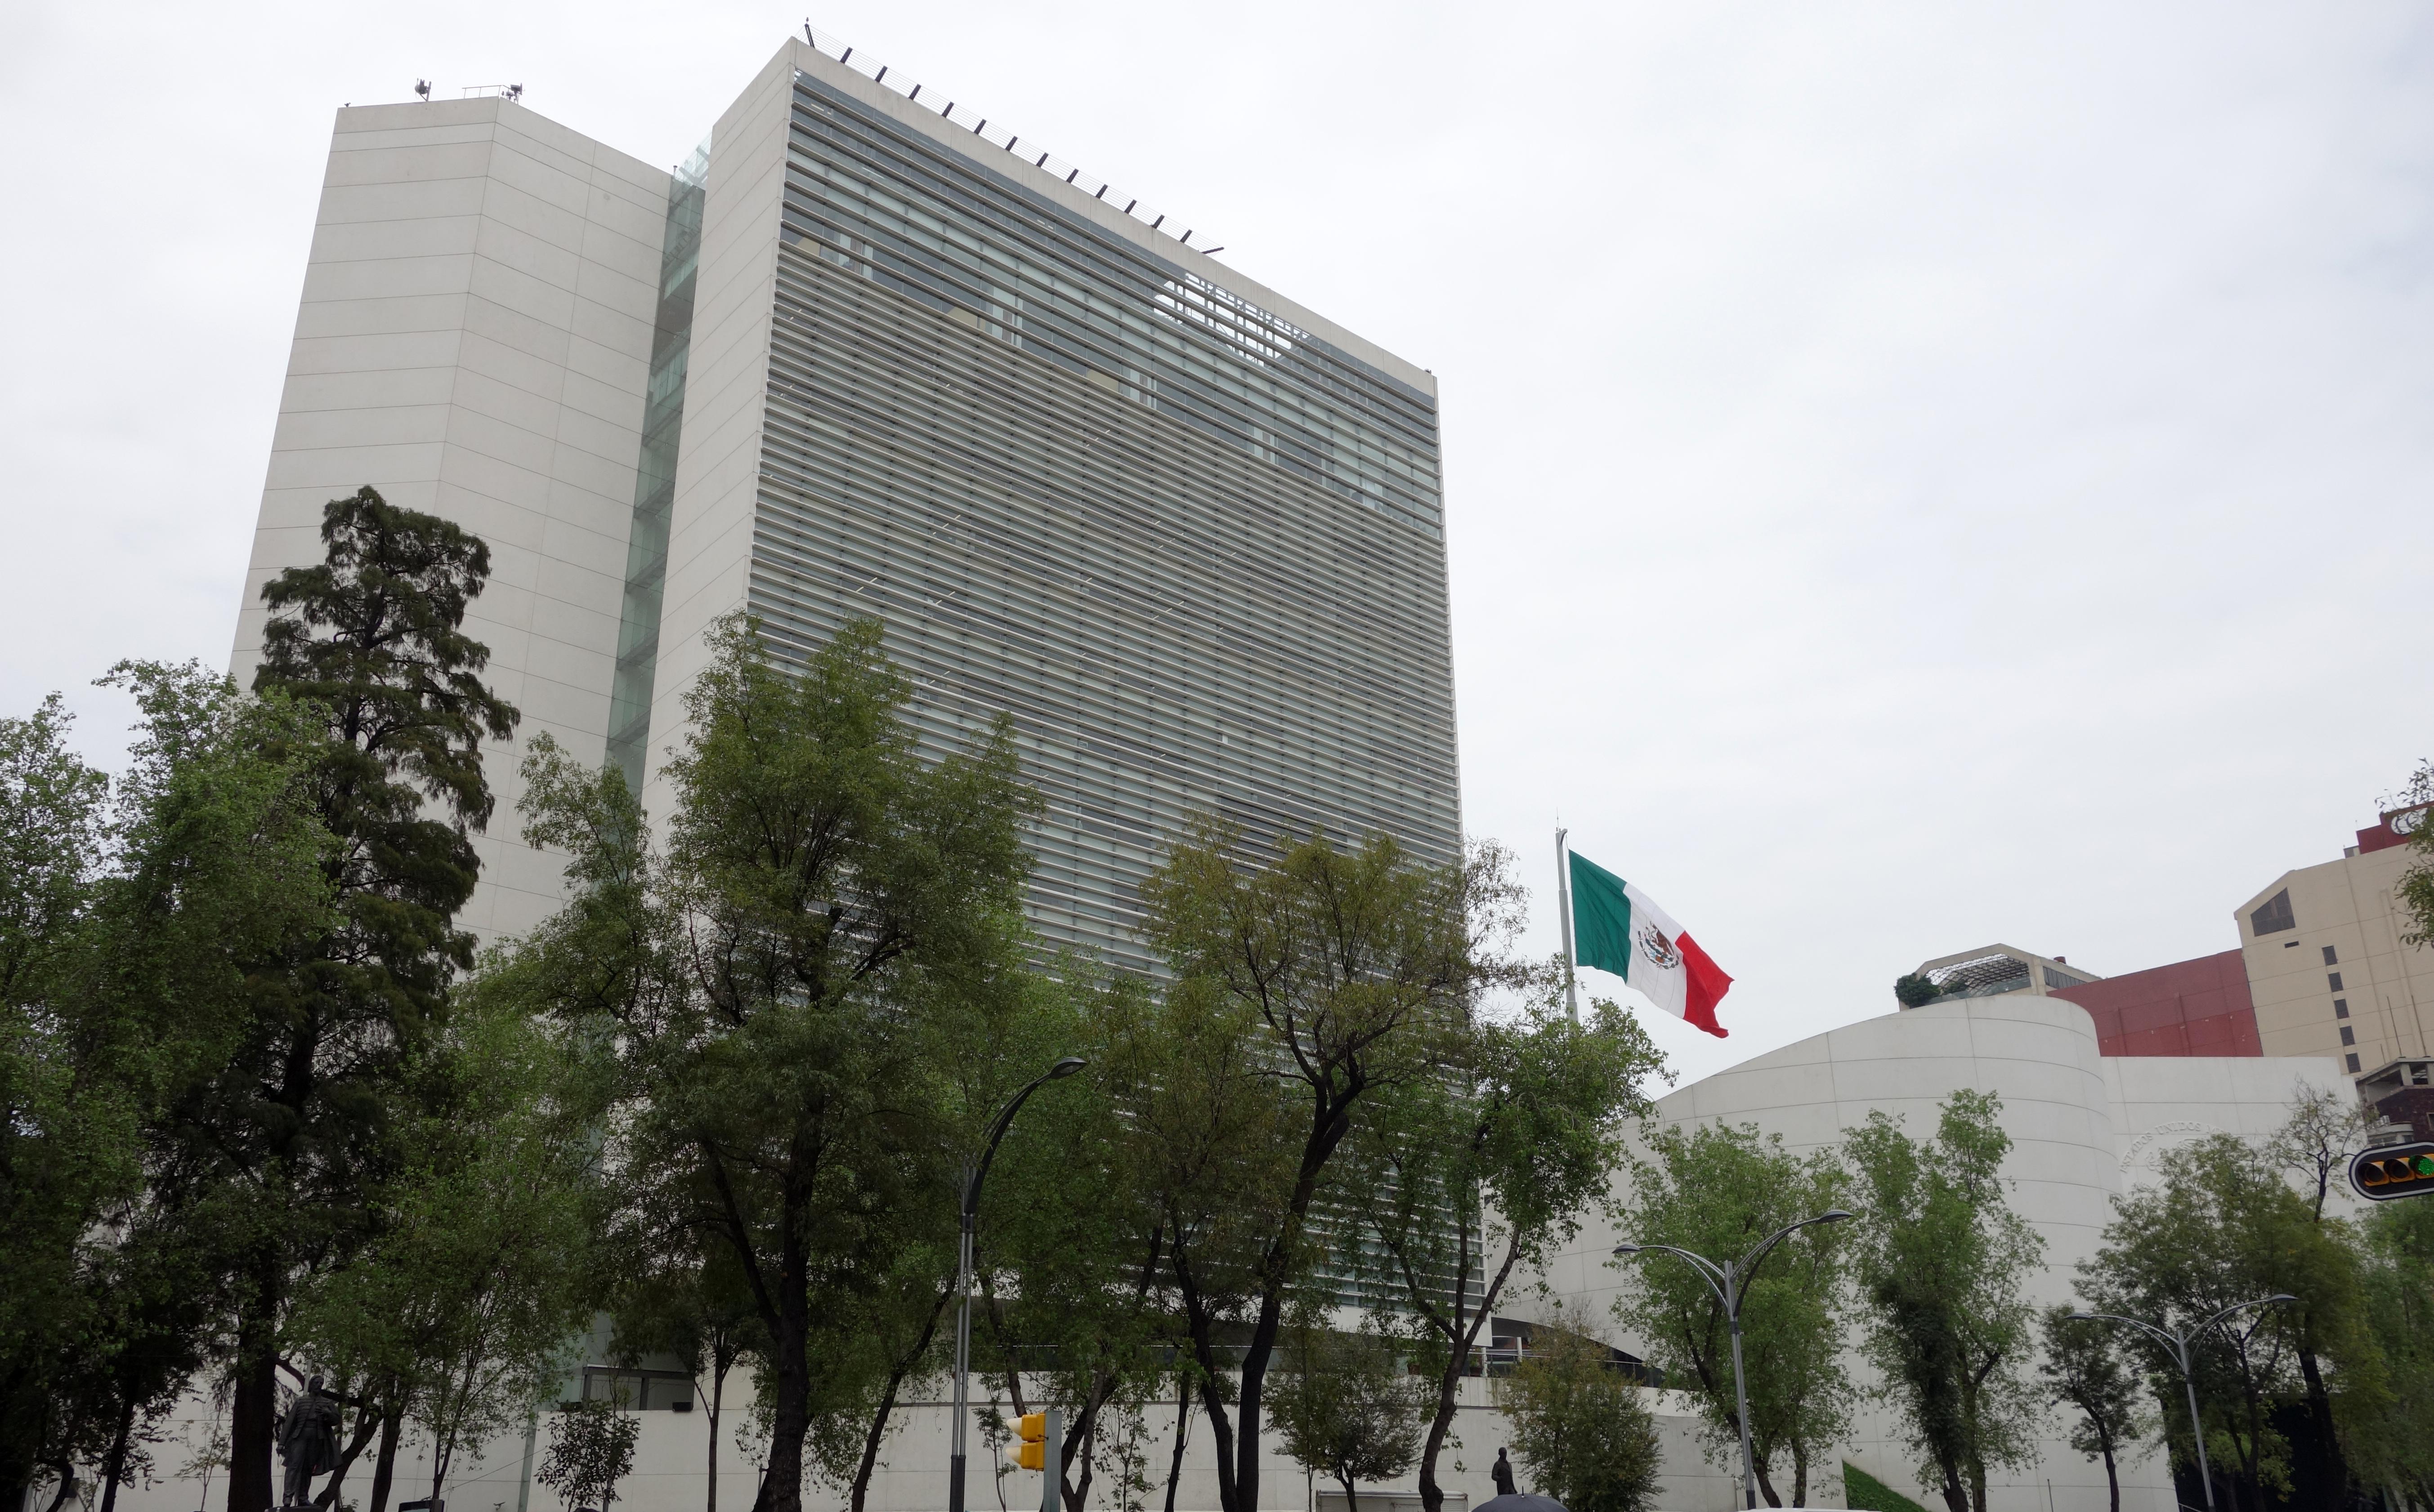 Mexico senate votes to extend high court president's term